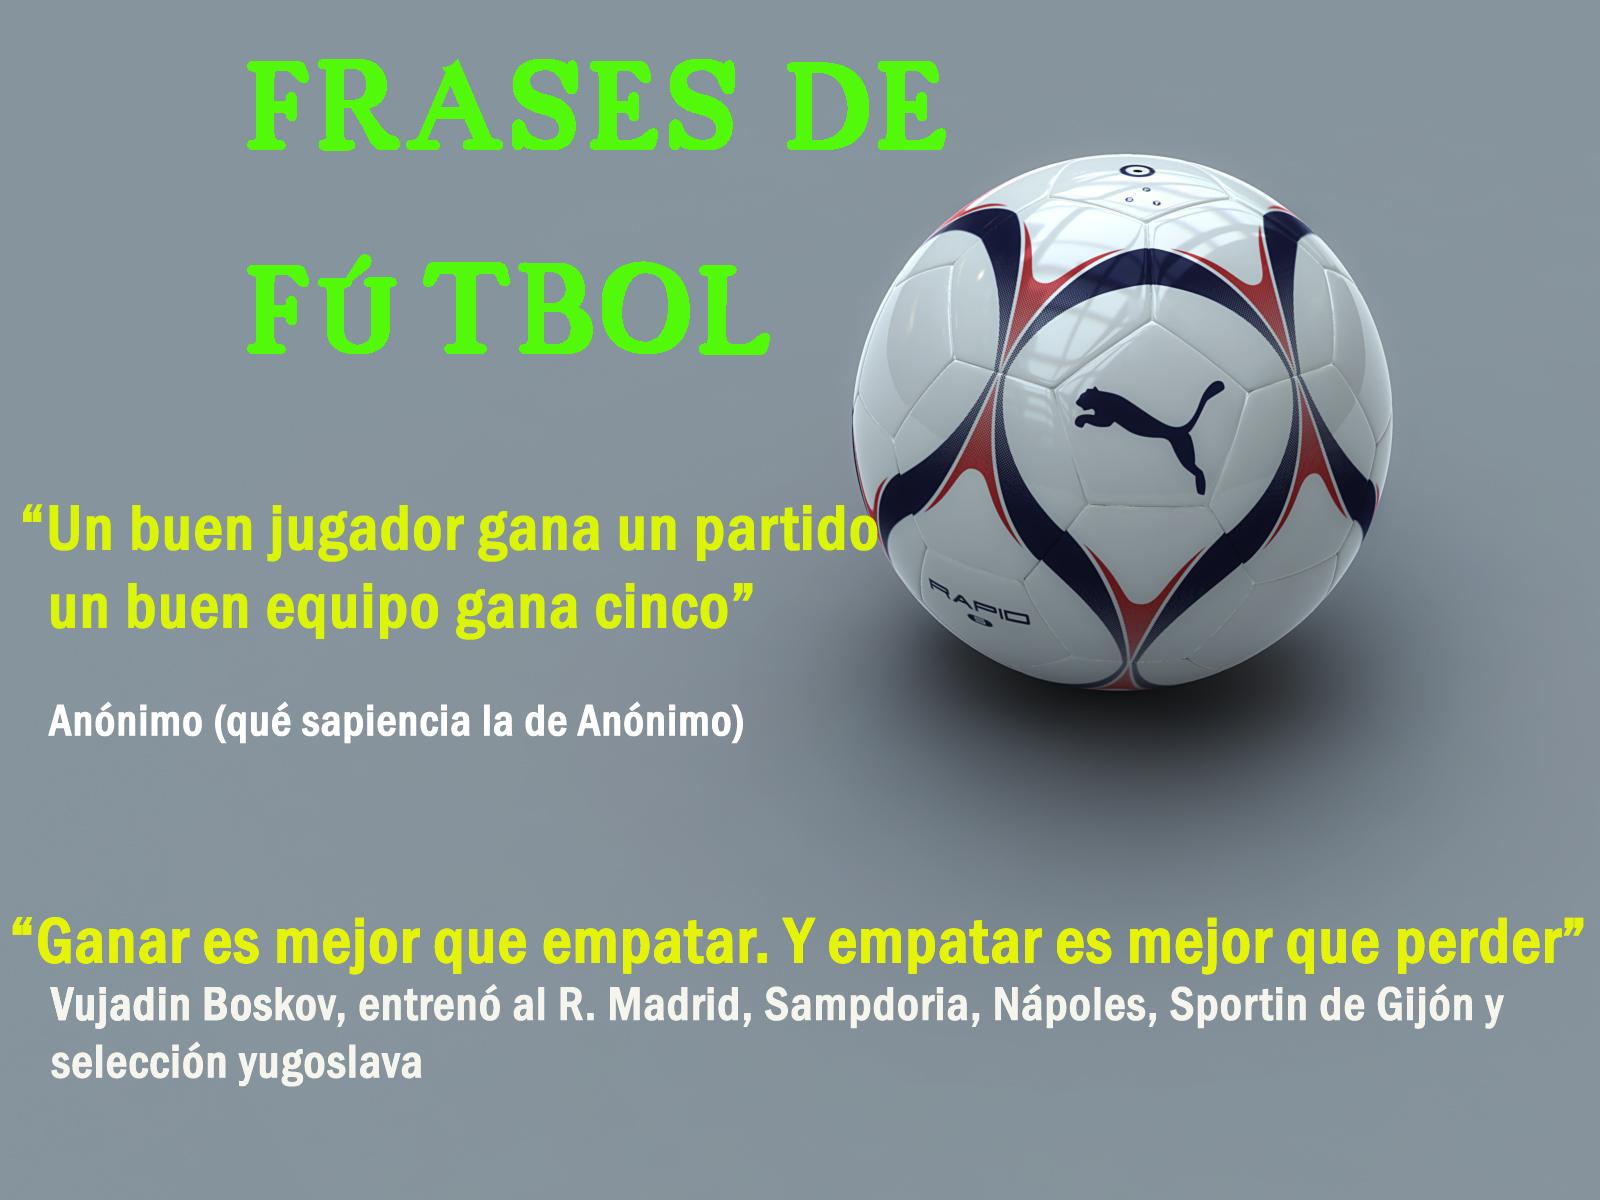 Frases De Ftbol Frases Futbol On Twitter Auto Design Tech